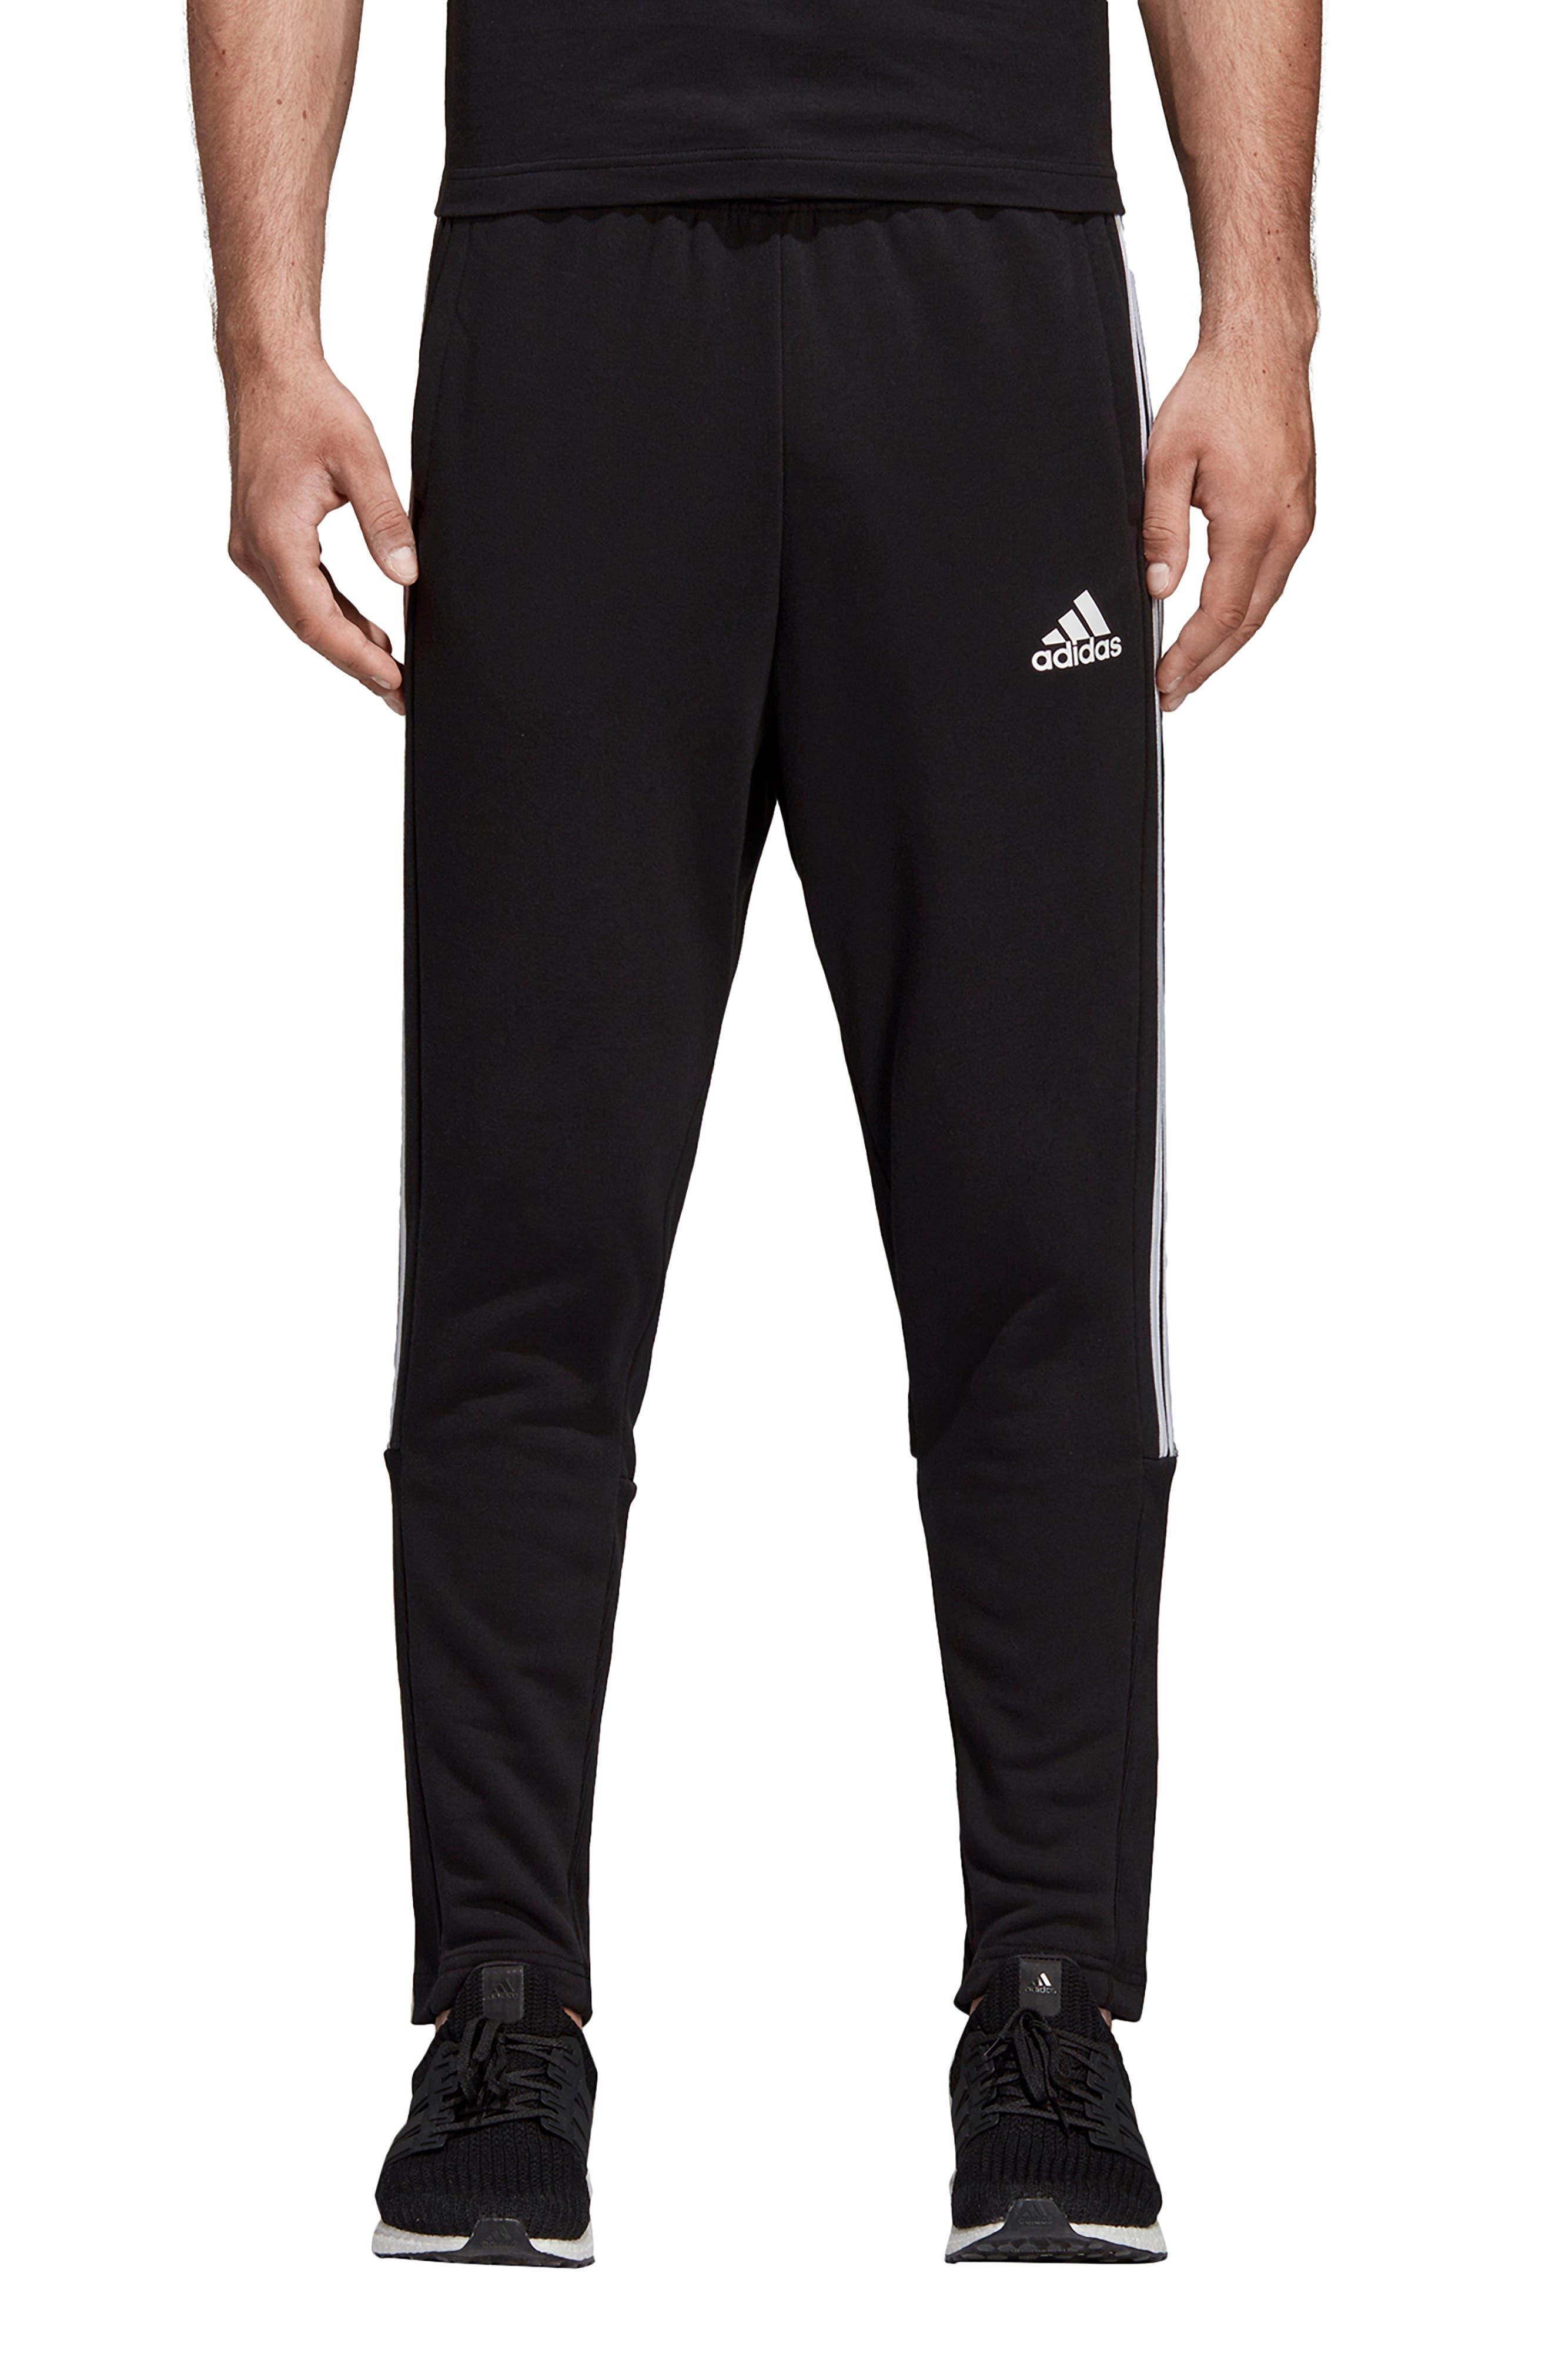 ADIDAS MH 3S Tiro Sweatpants, Main, color, BLACK/ WHITE